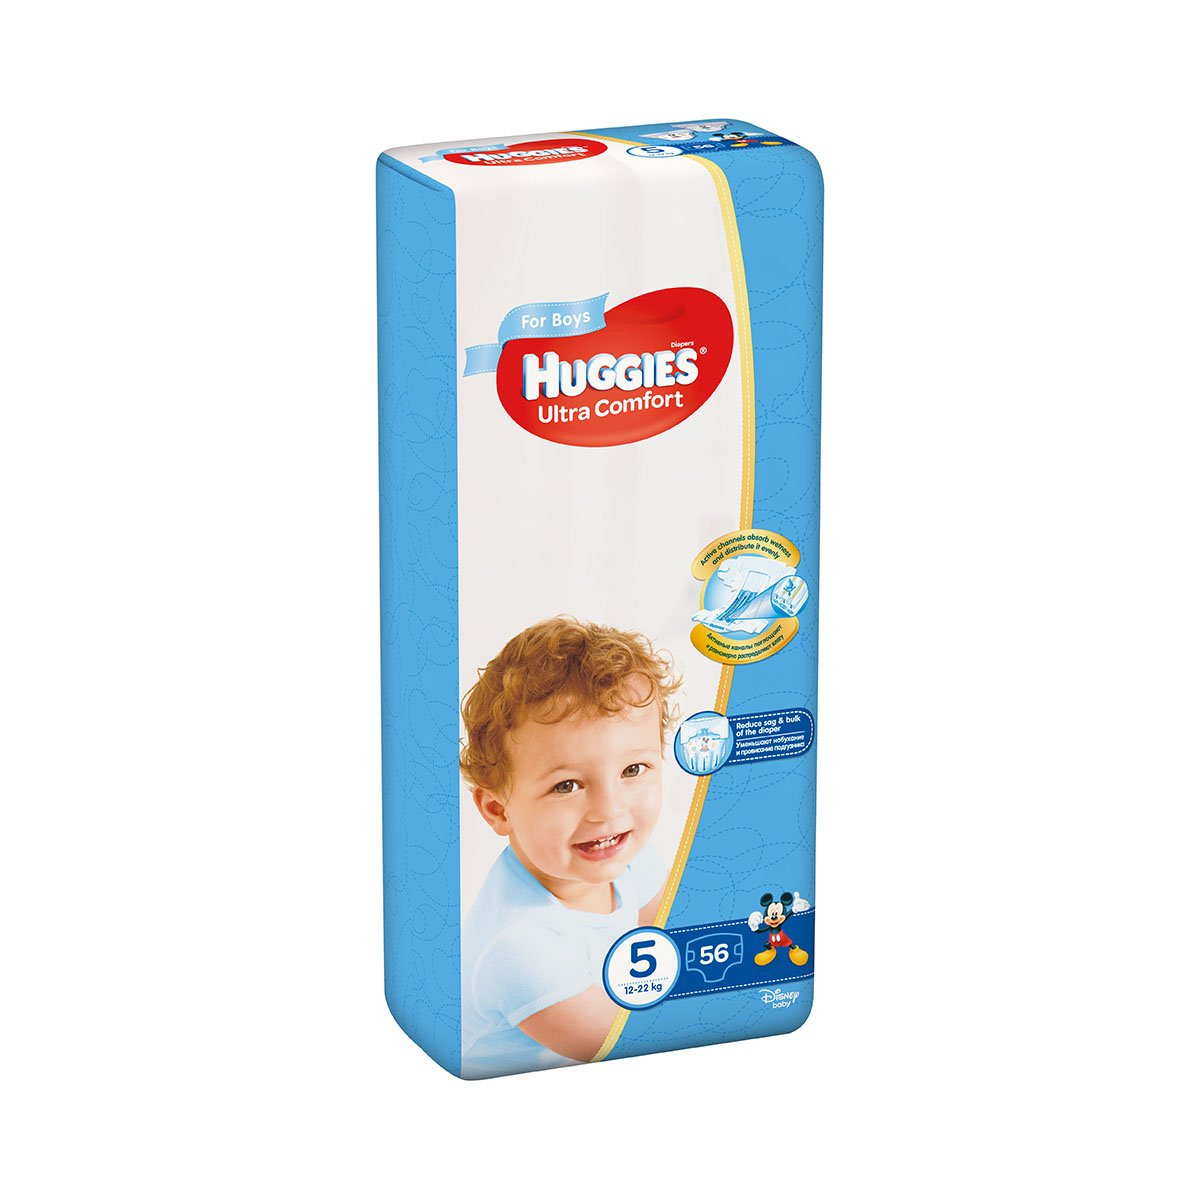 Scutece Huggies Ultra Comfort Boys, Nr 5, 12 - 22 Kg, 56 buc imagine 2021